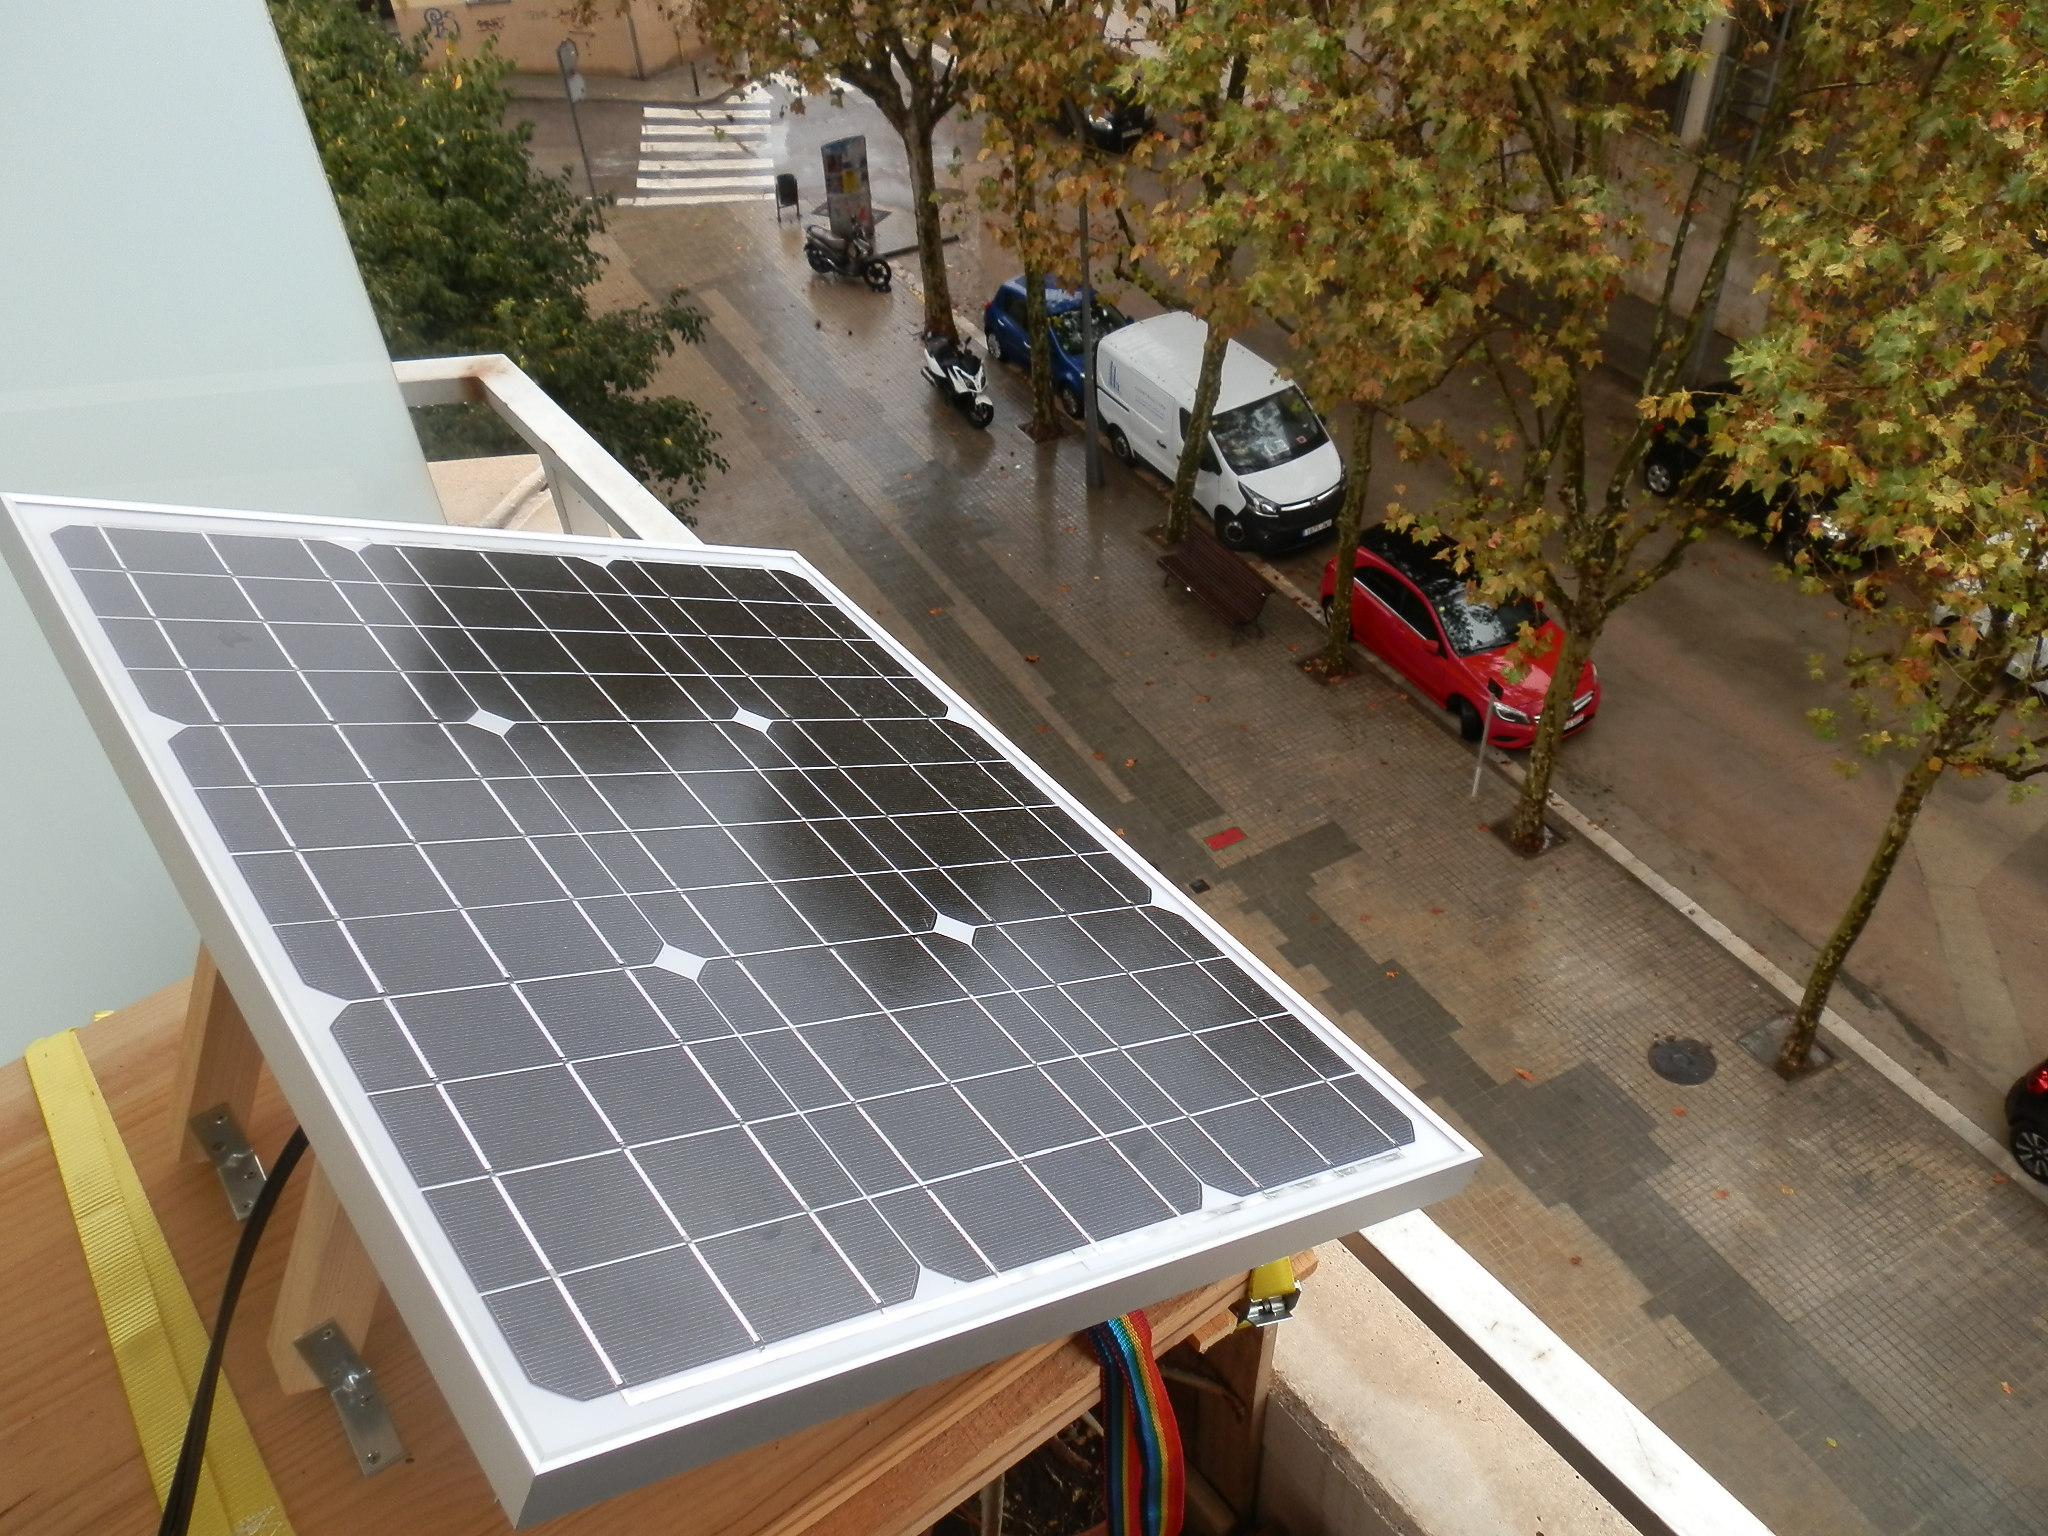 Домашний веб-сервер на солнечных батареях отработал 15 месяцев: аптайм 95,26% - 15